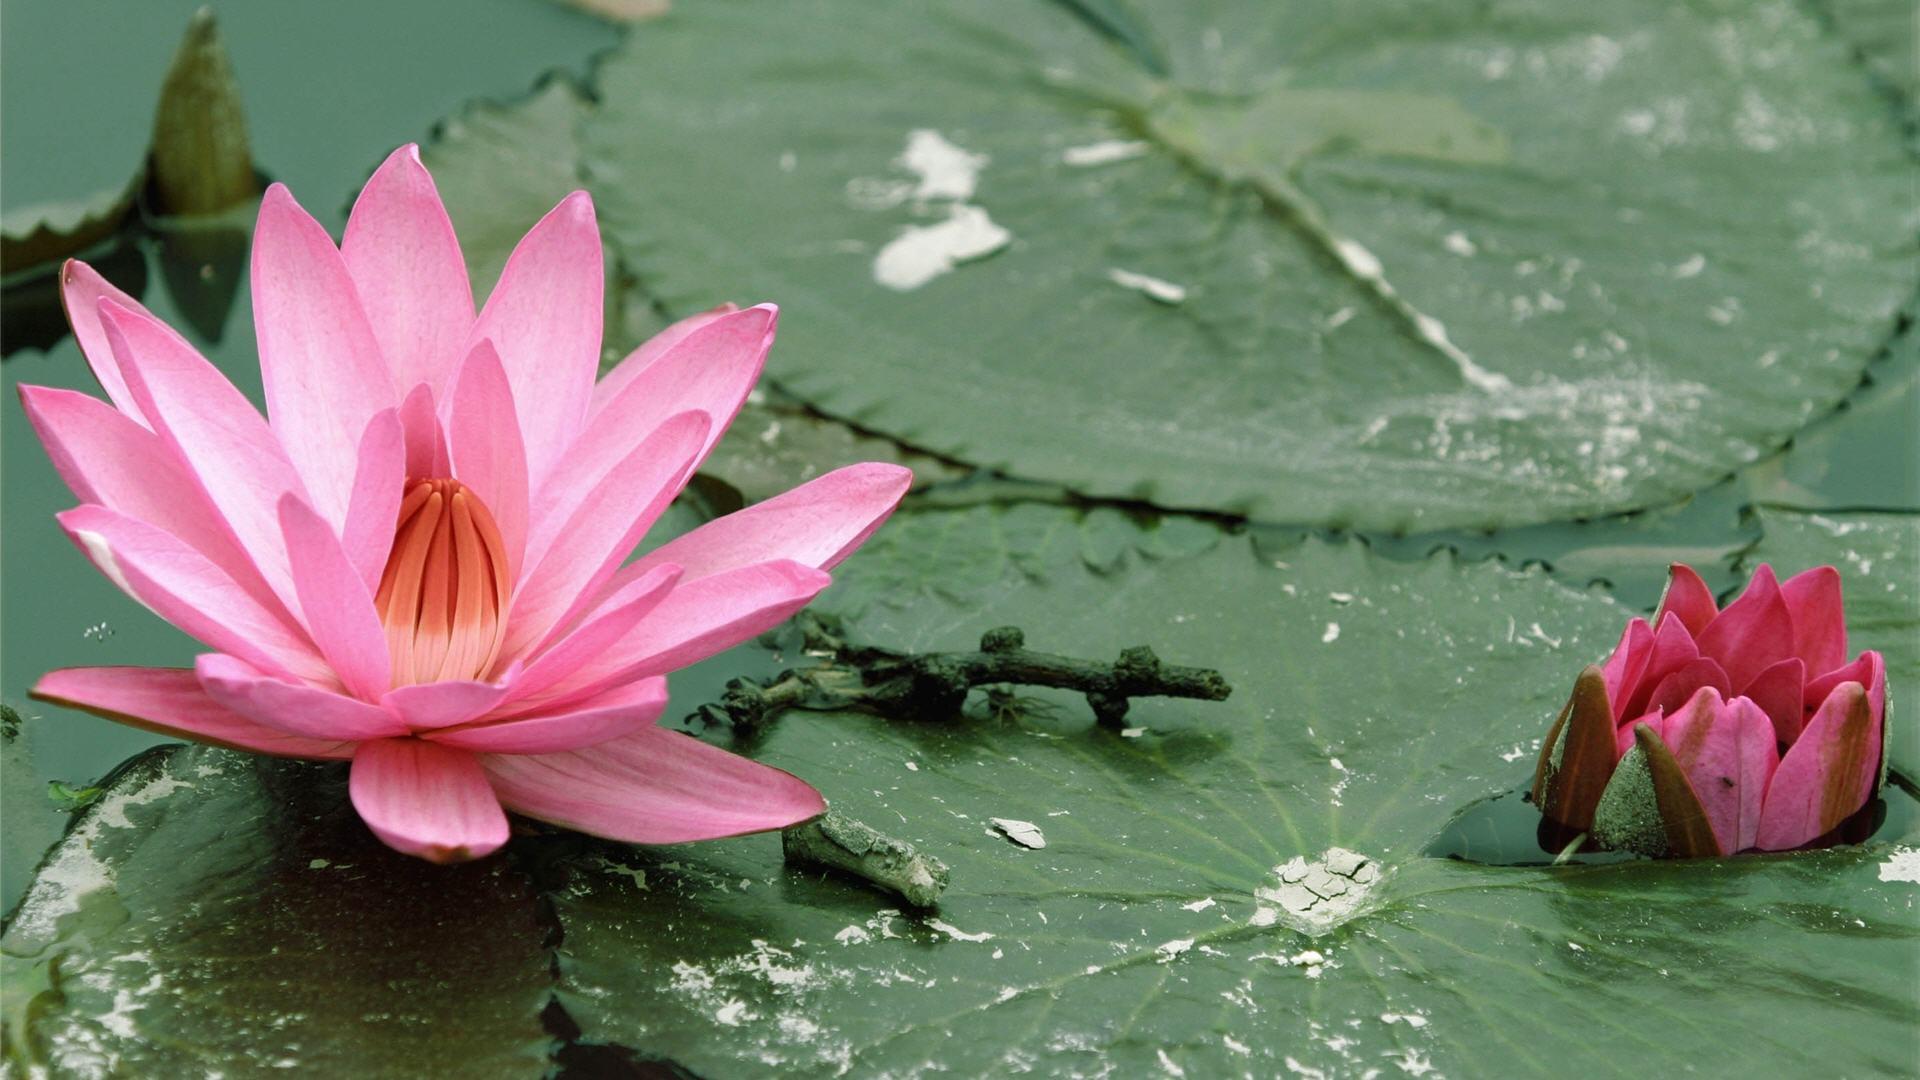 Ideas About Lotus Flower Wallpaper On Pinterest 1920x1080